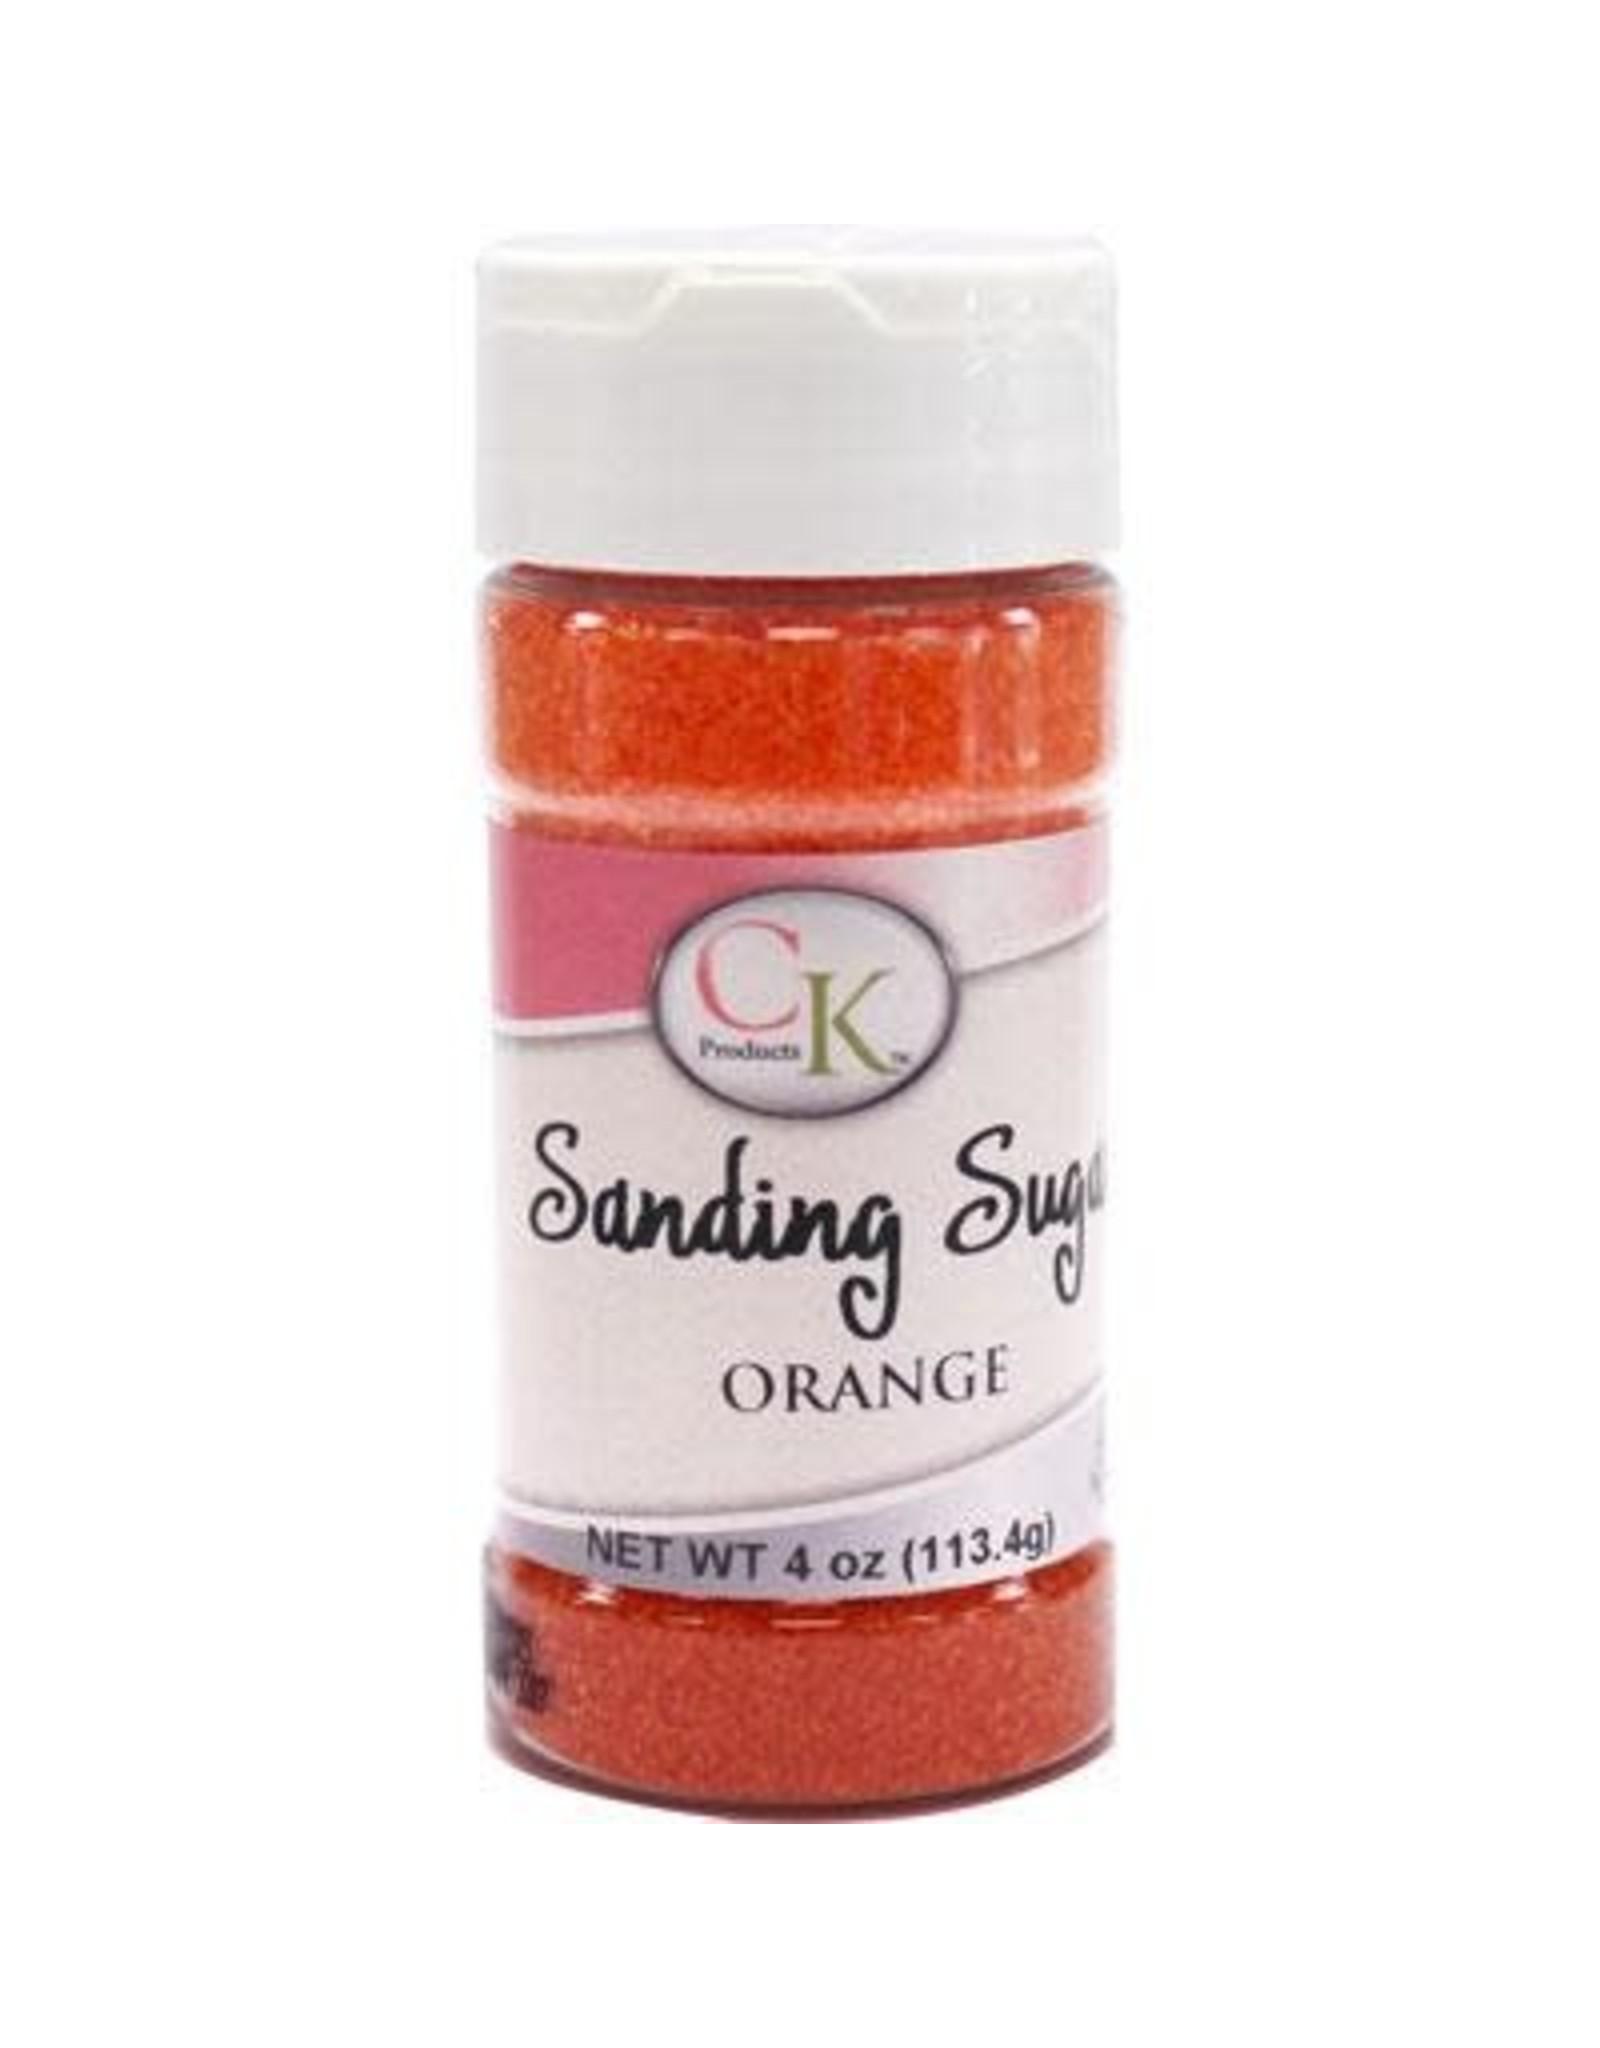 CK Orange Sanding Sugar